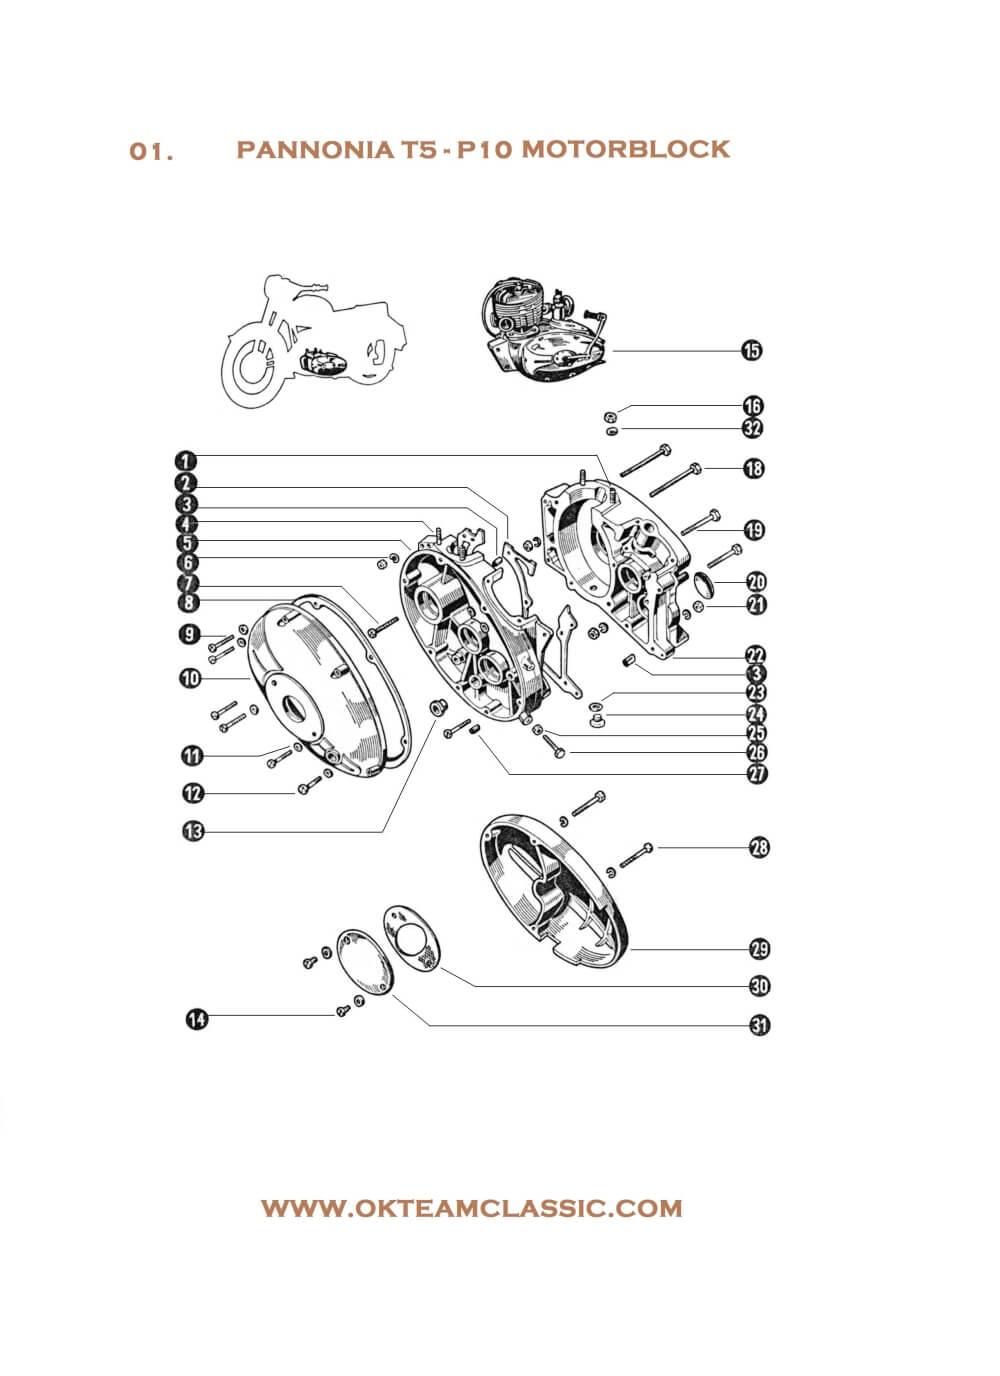 01. Engine parts